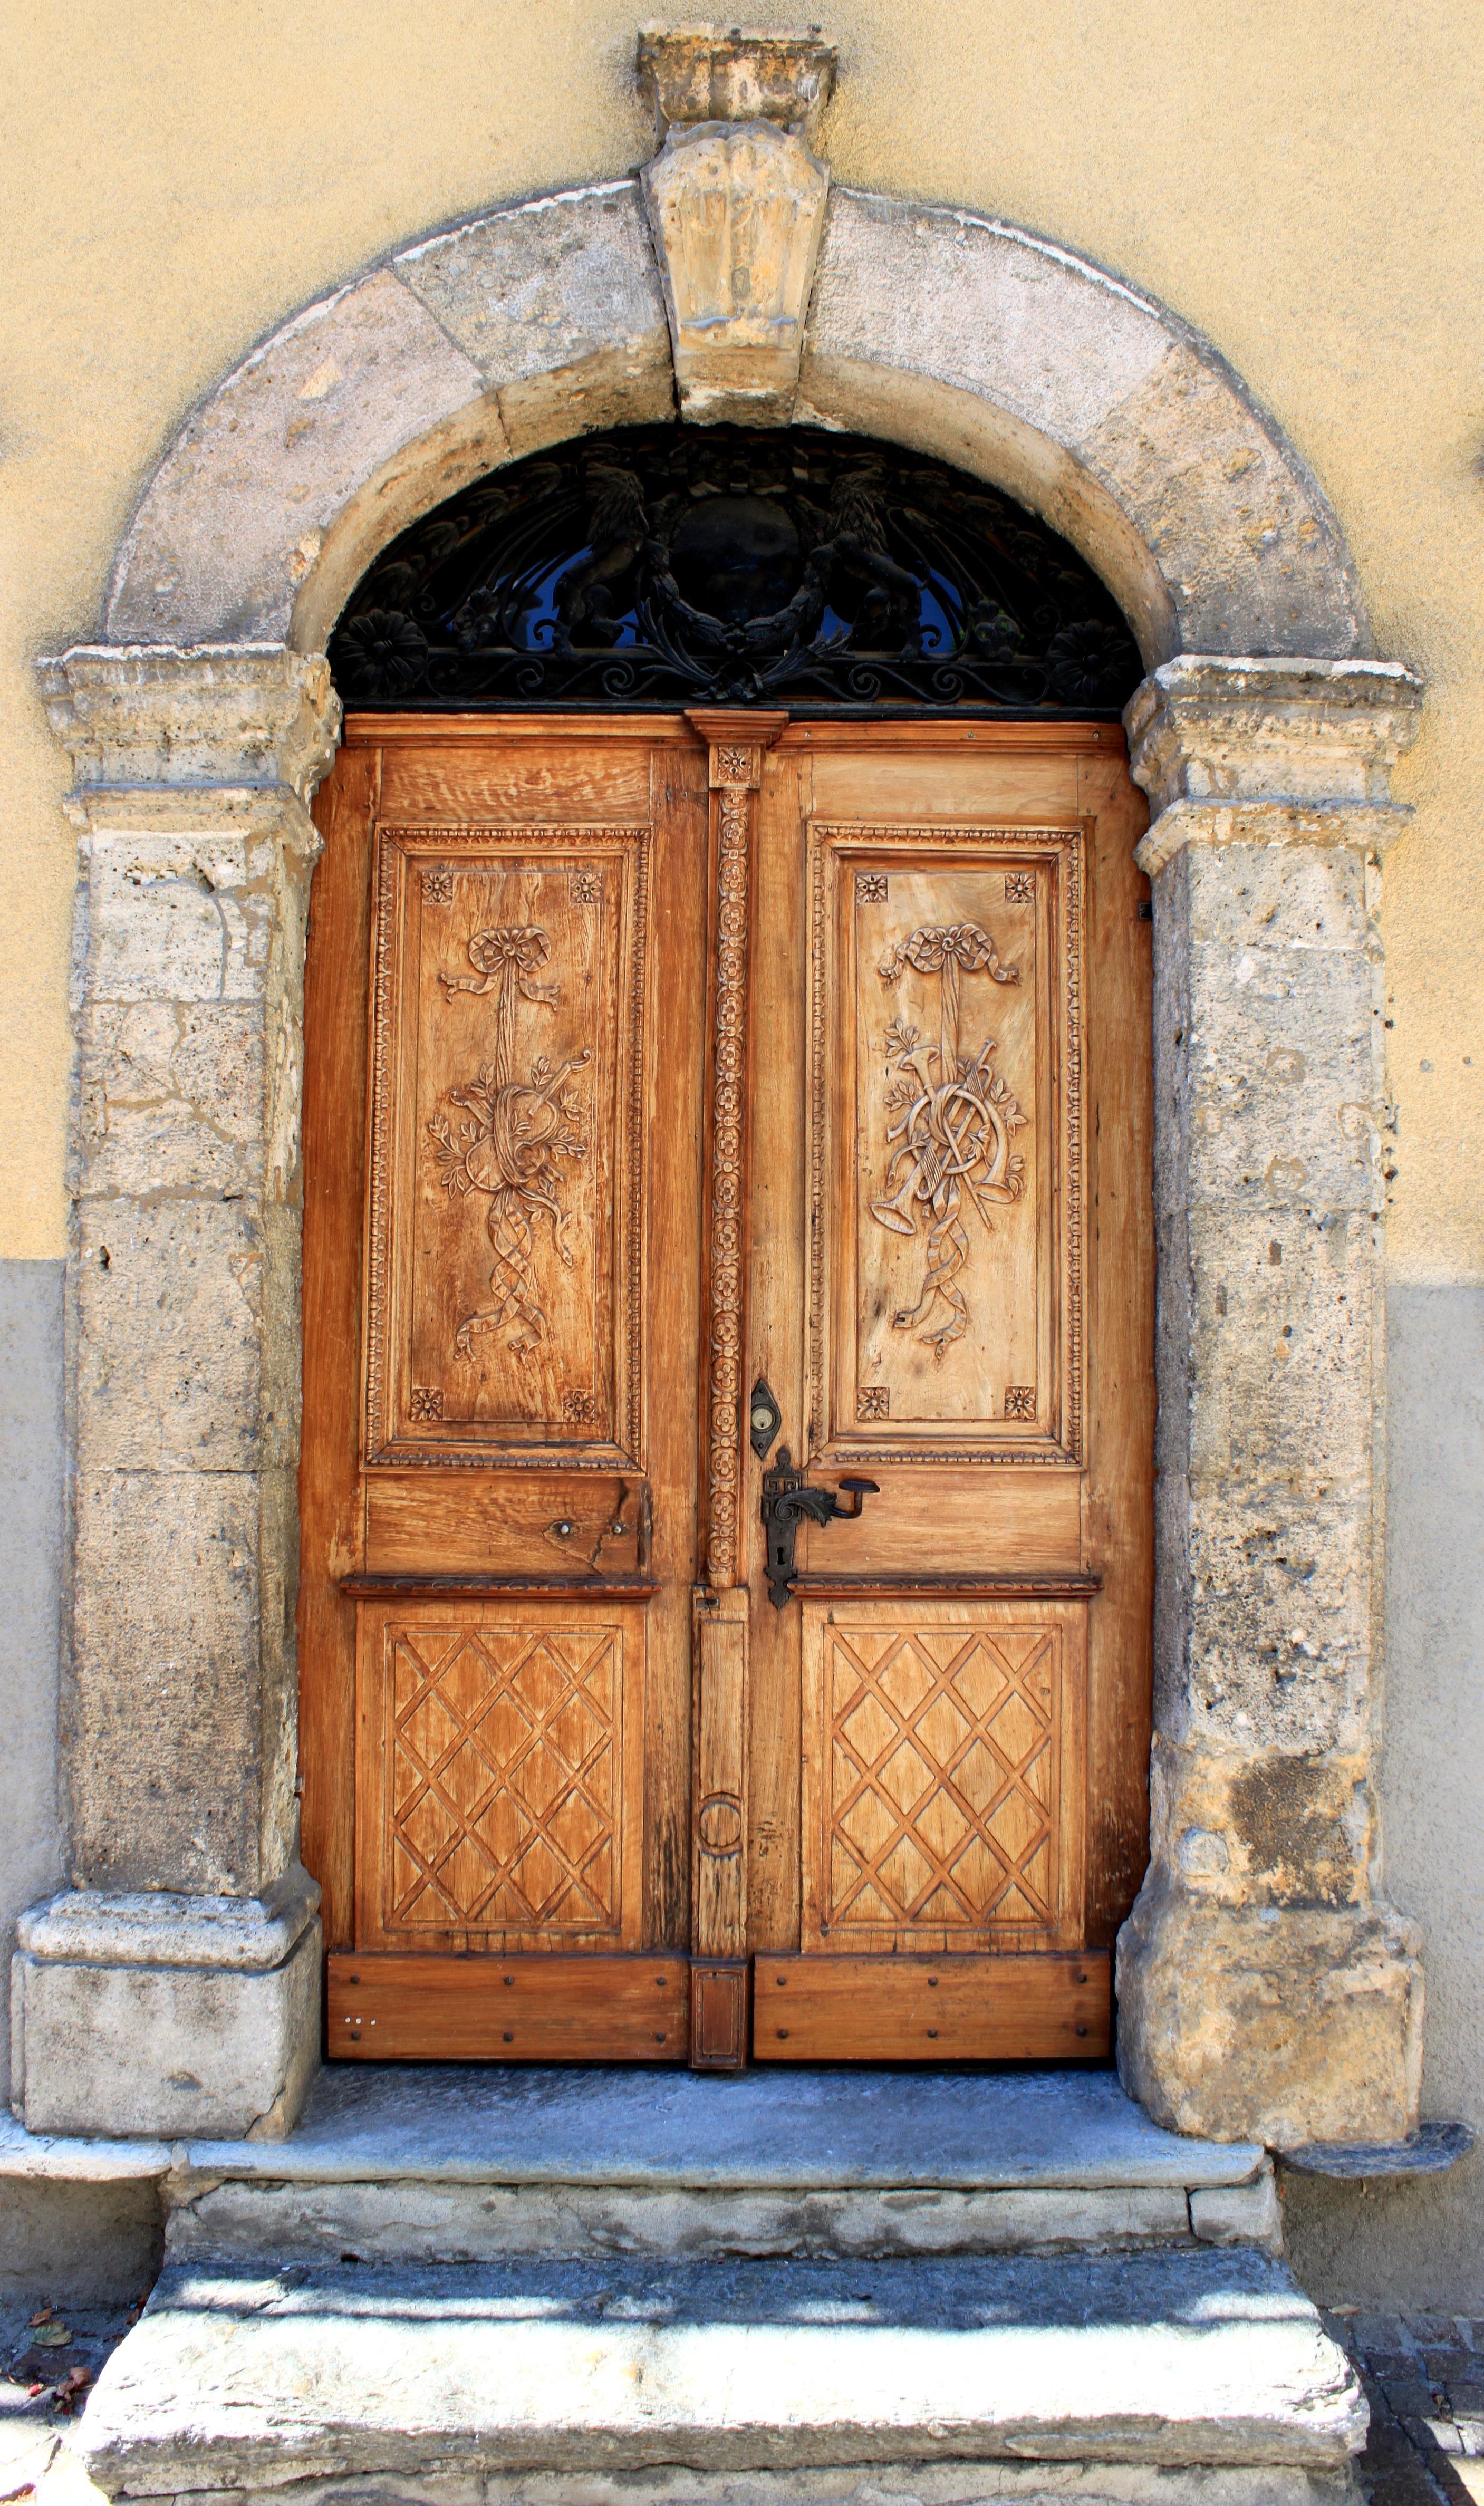 file sion cath drale notre dame du glarier porte en bois sculpt jpg wikimedia commons. Black Bedroom Furniture Sets. Home Design Ideas